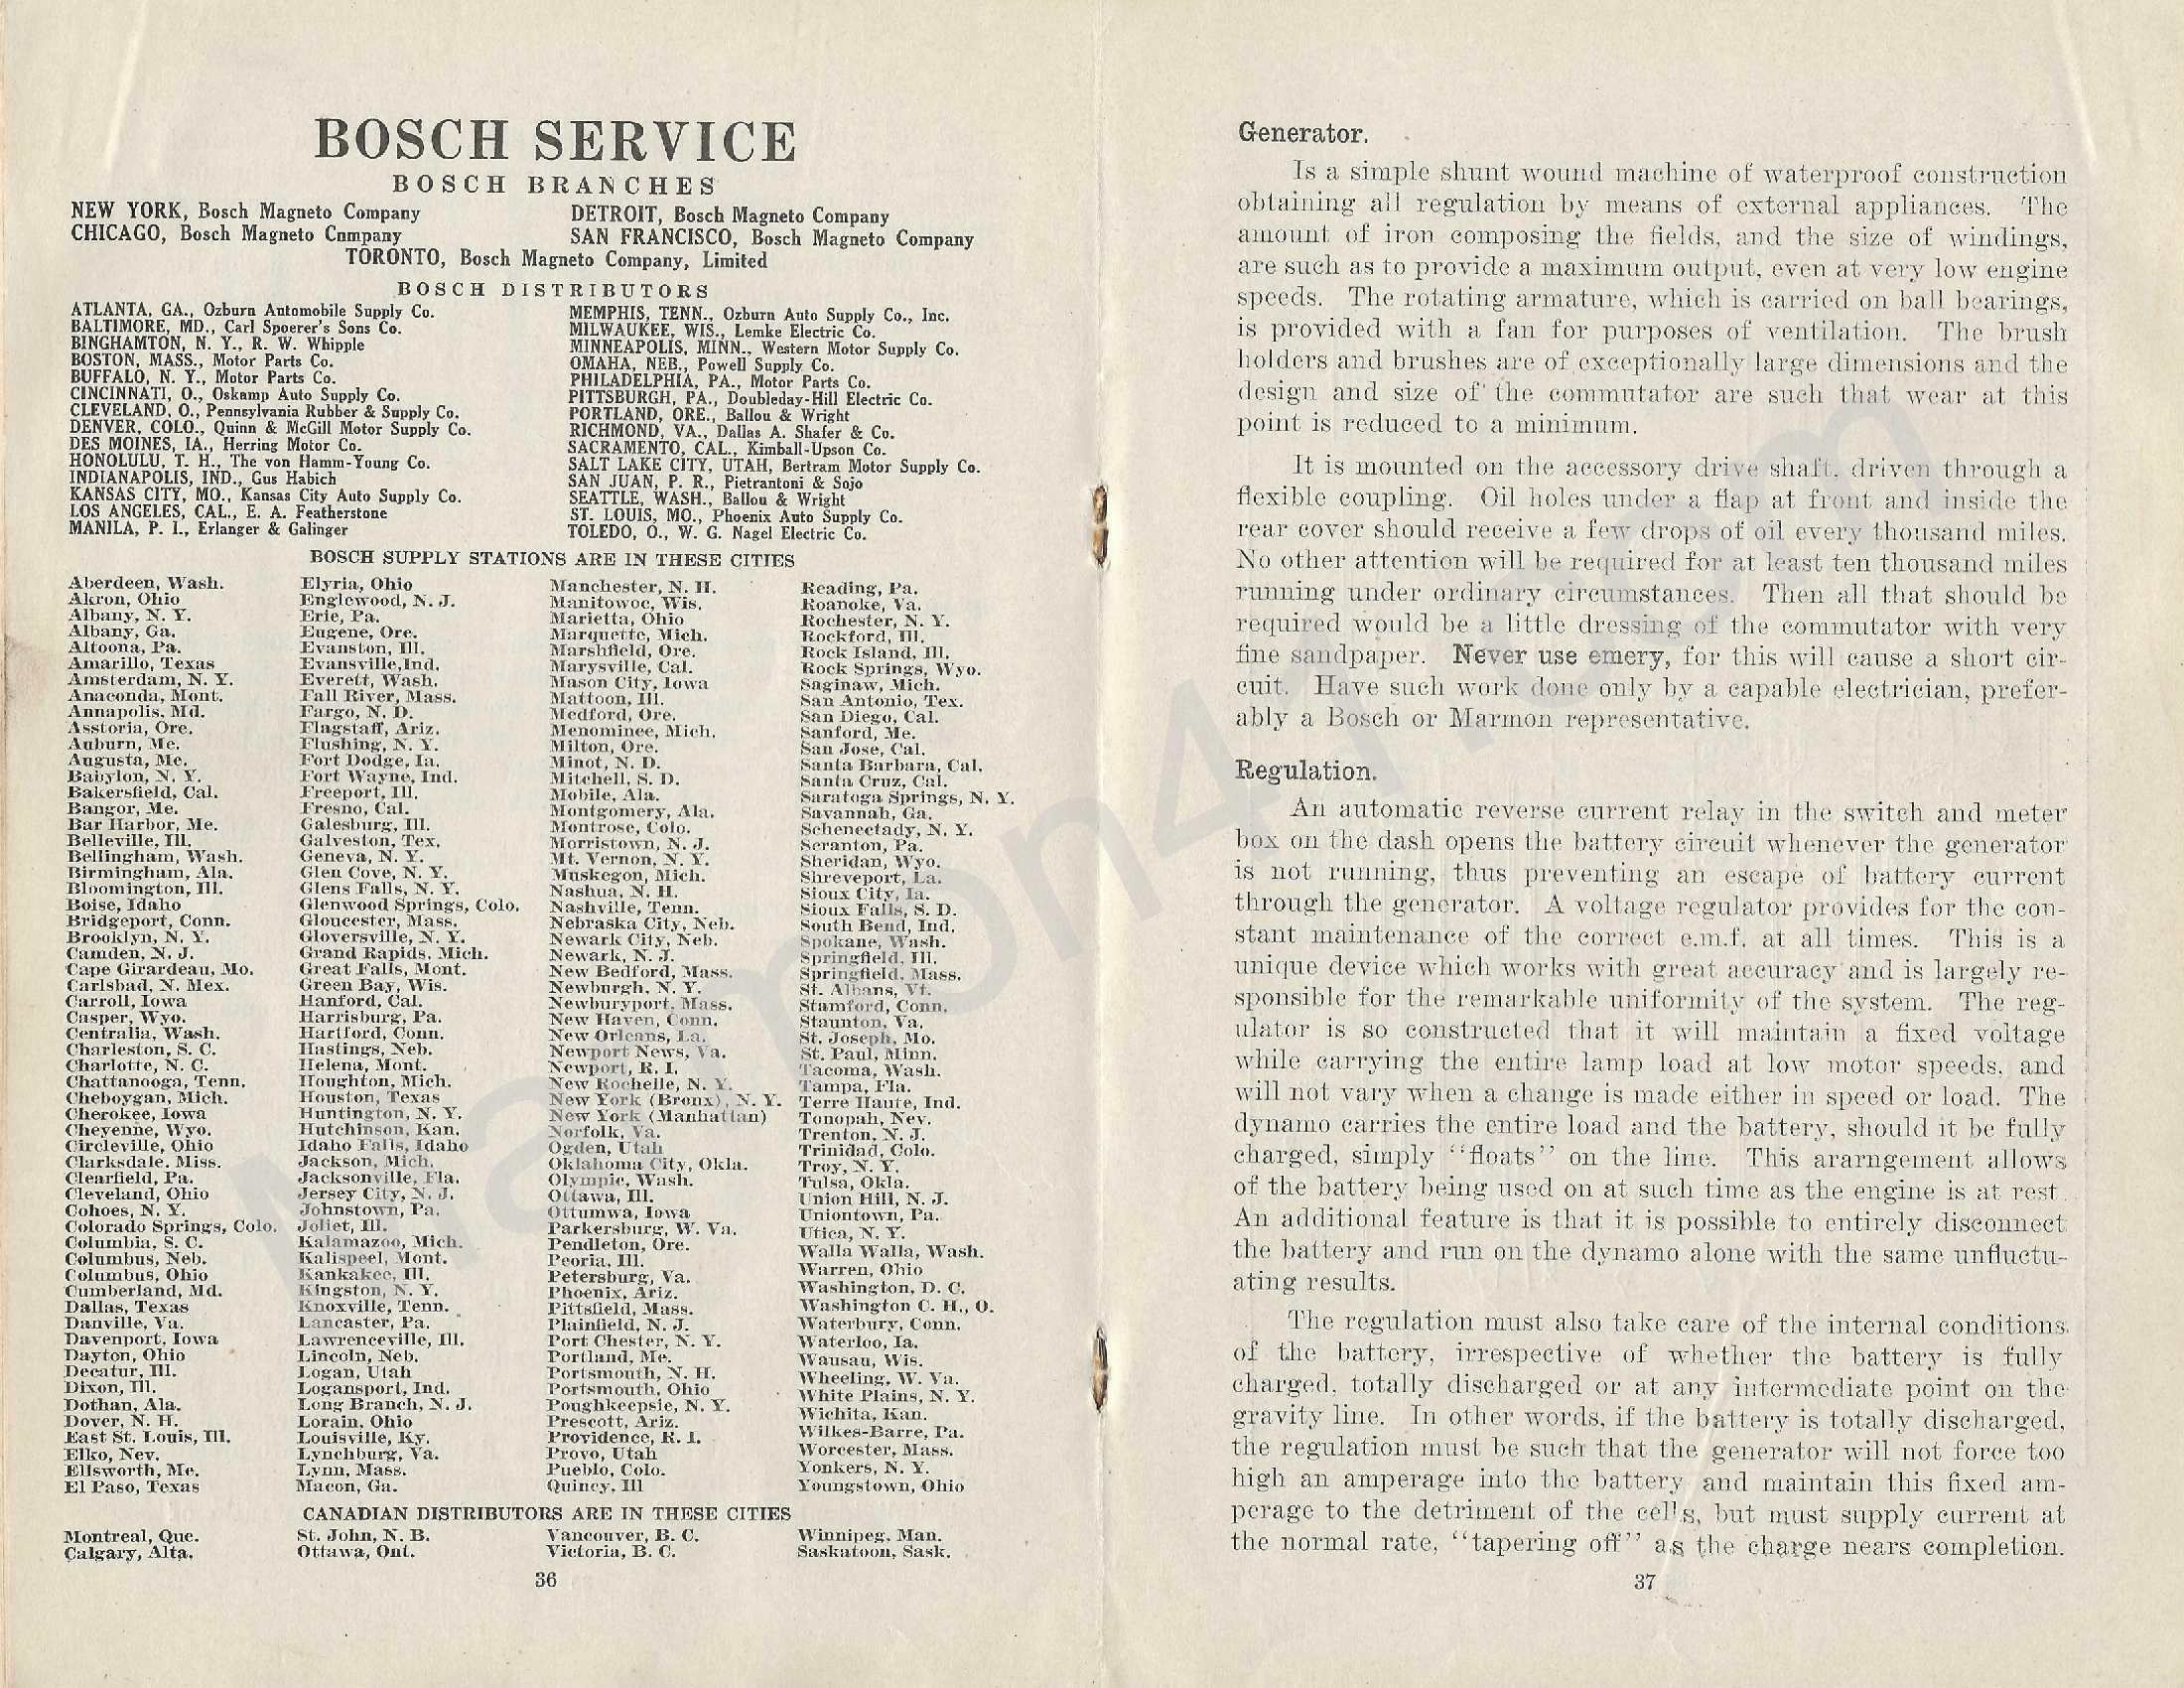 1915-07-01_Marmon41_Info_Book_1534-B_20